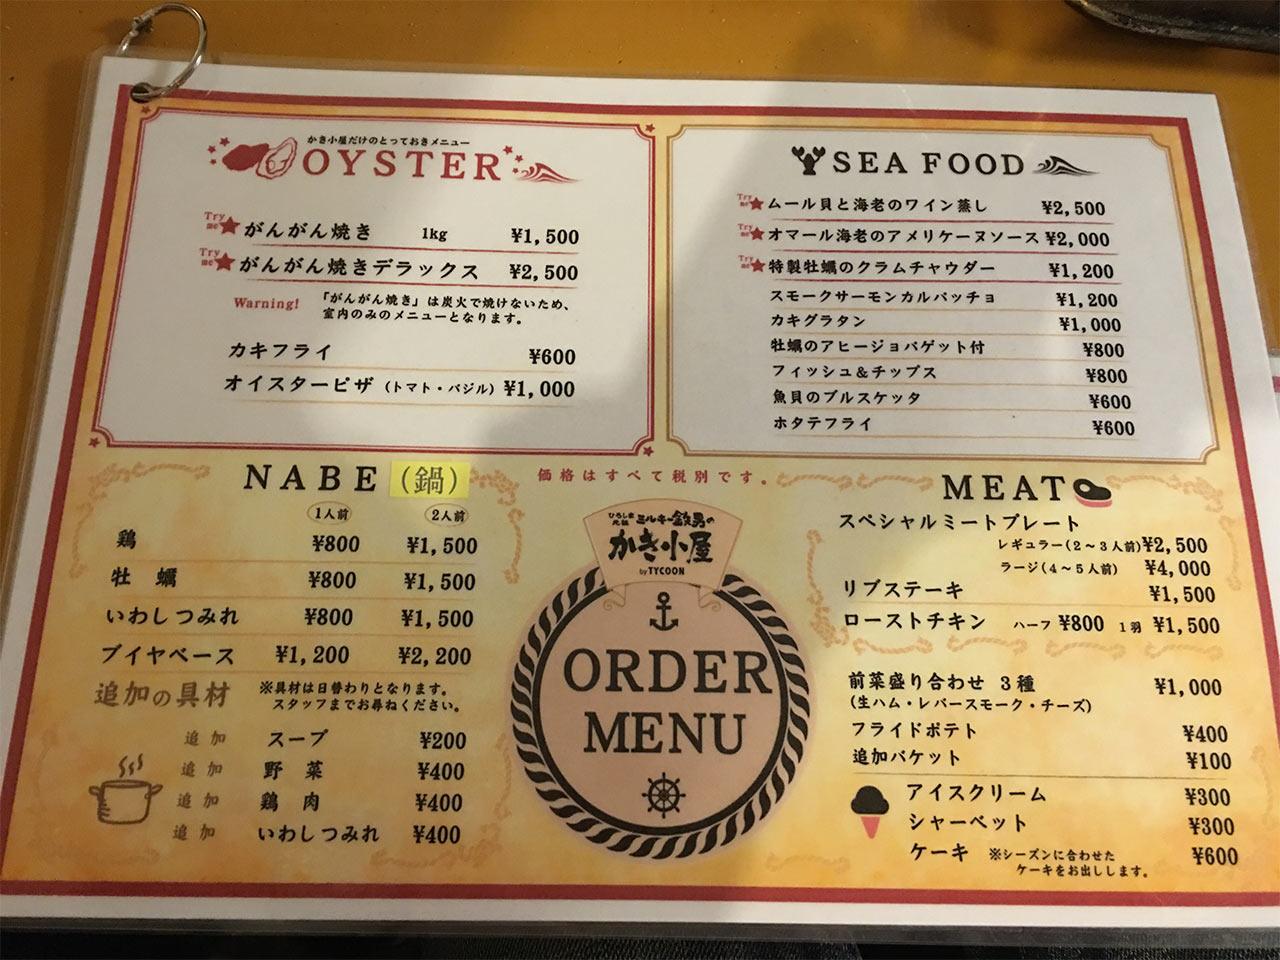 kaki-goya-tycoon-menu02